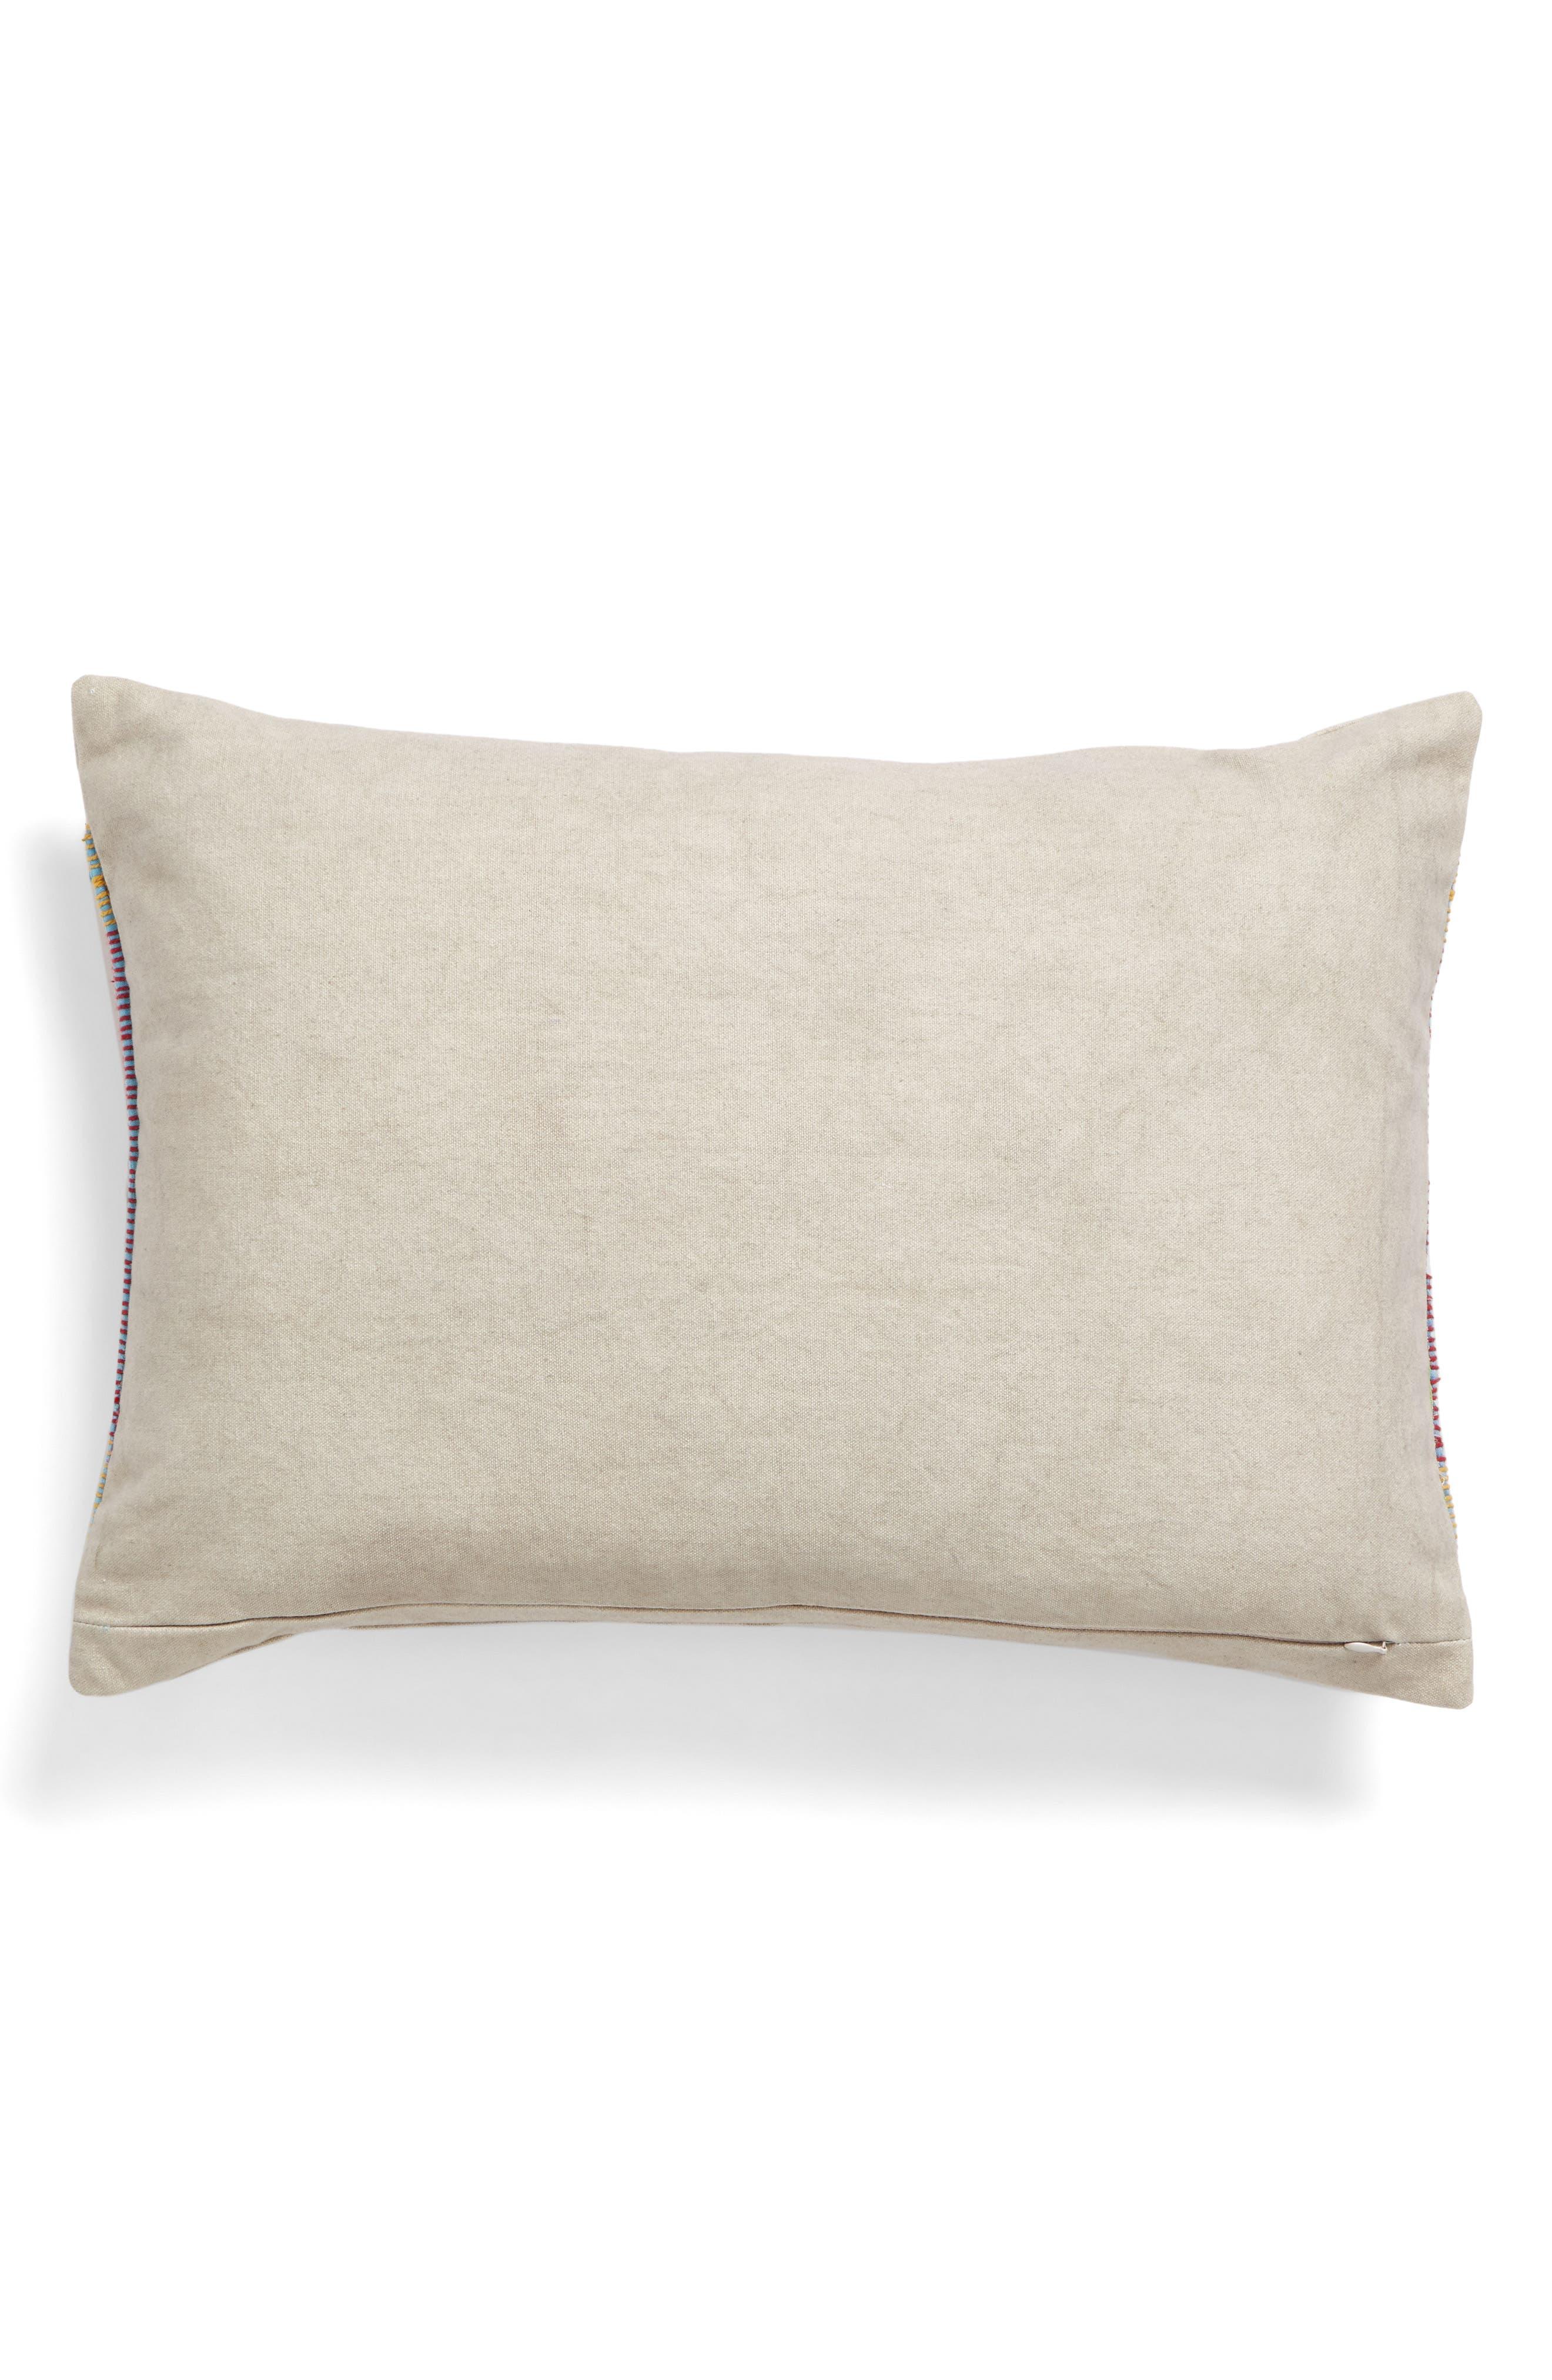 Woven Accent Pillow,                             Alternate thumbnail 2, color,                             250